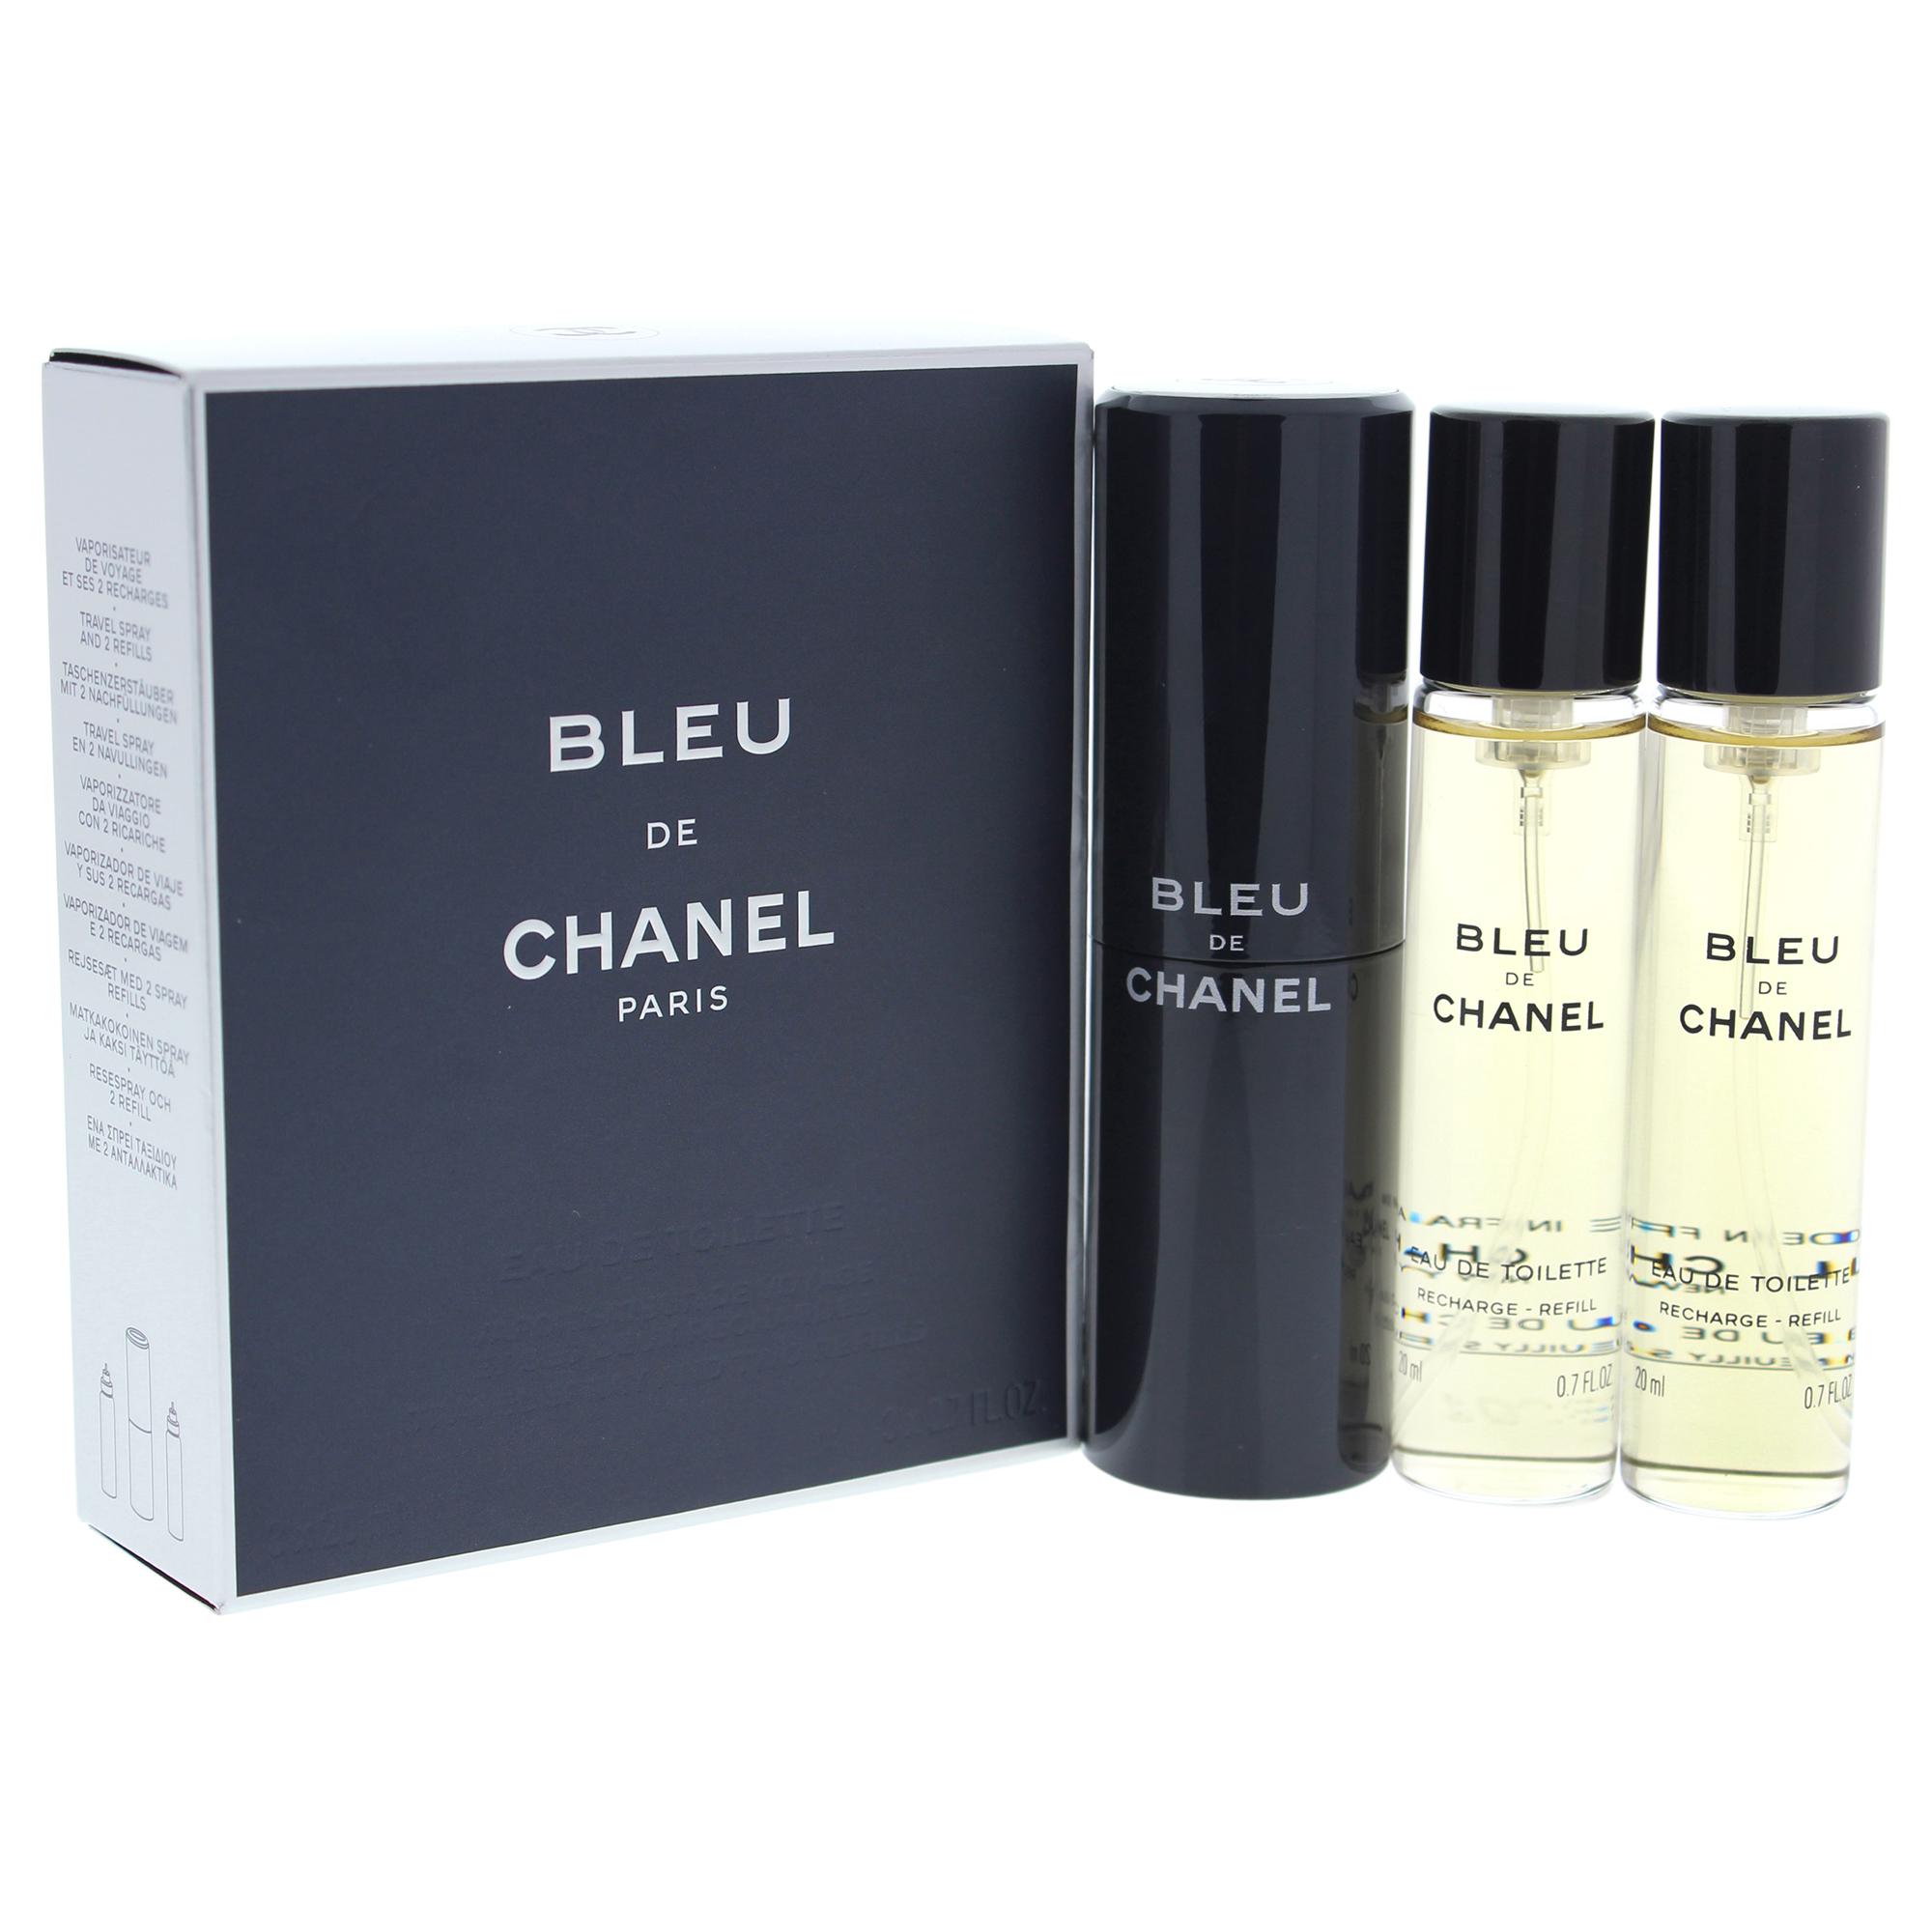 Bleu De Chanel by Chanel for Men - 3 x 0.7 oz EDT (Refills Travel Spray)